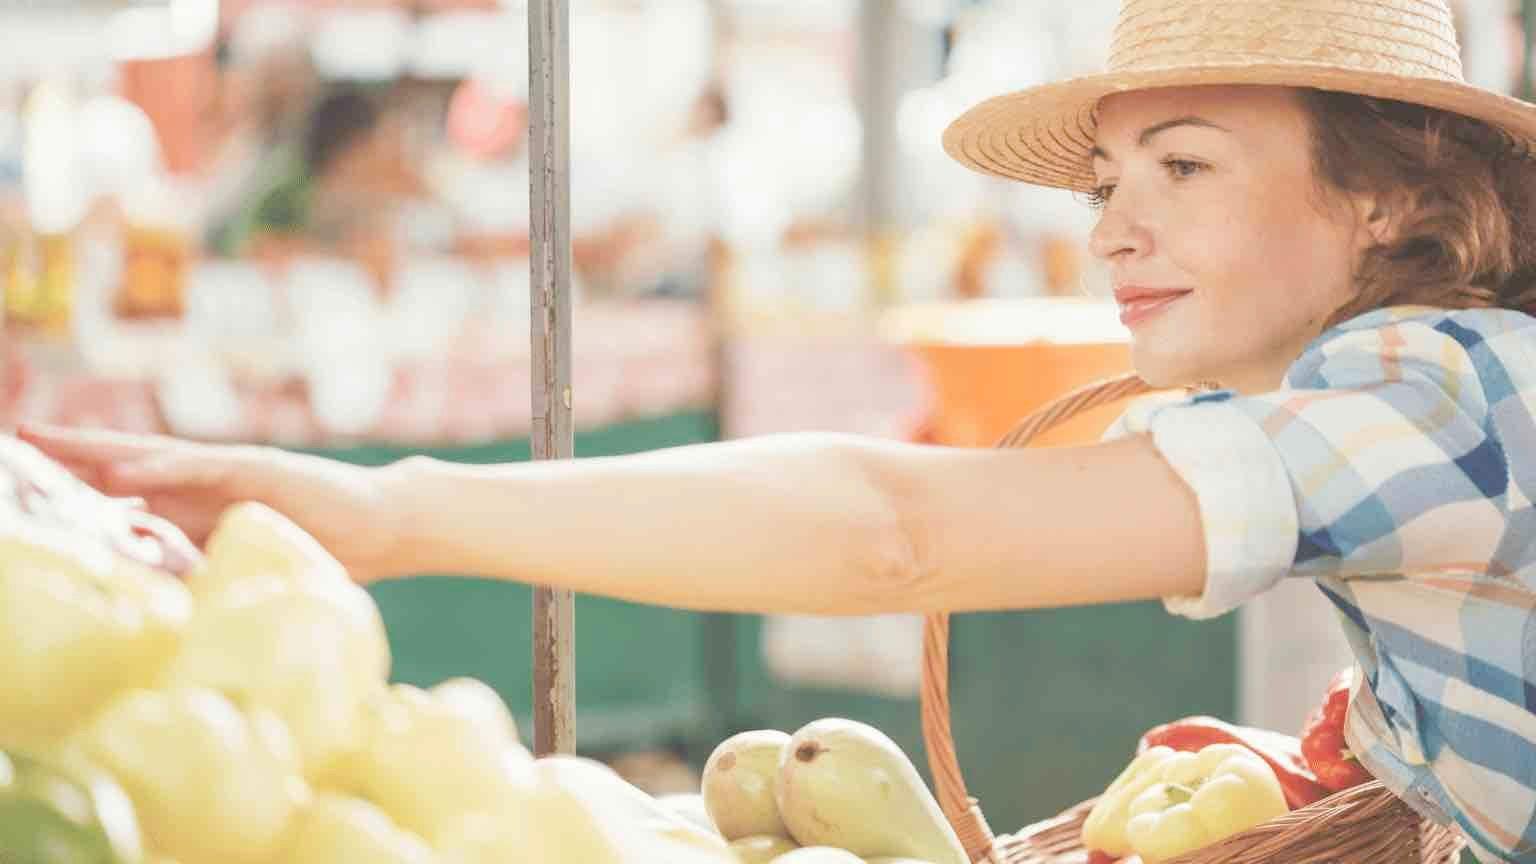 Woman shopping at farmers market.